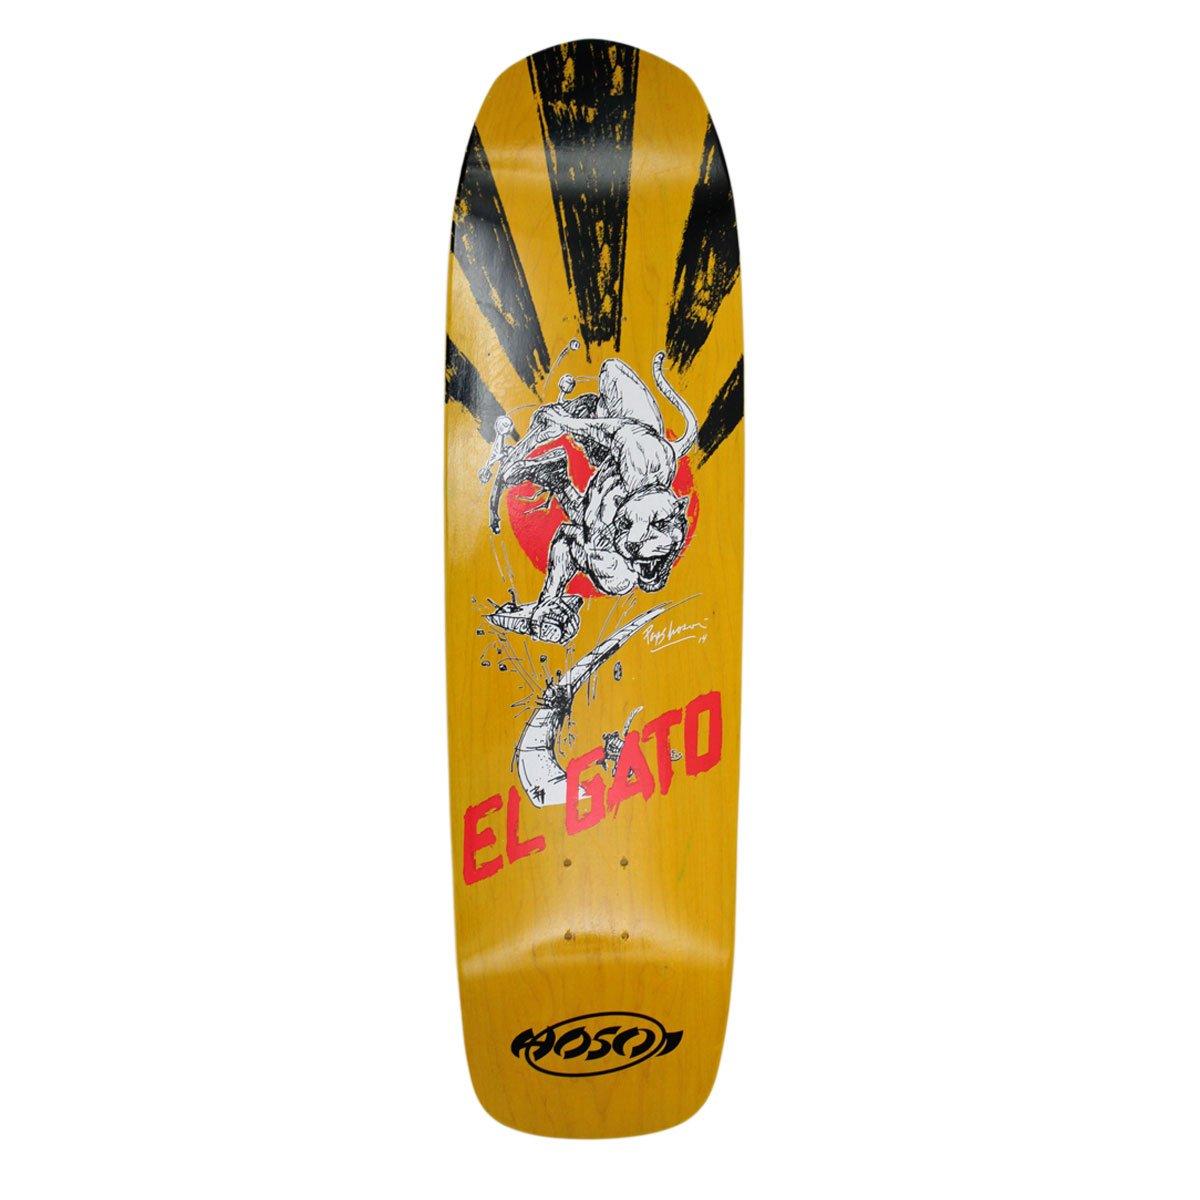 9 x 33-Inch Hosoi Skateboards Gonz 93 Skateboard Deck White